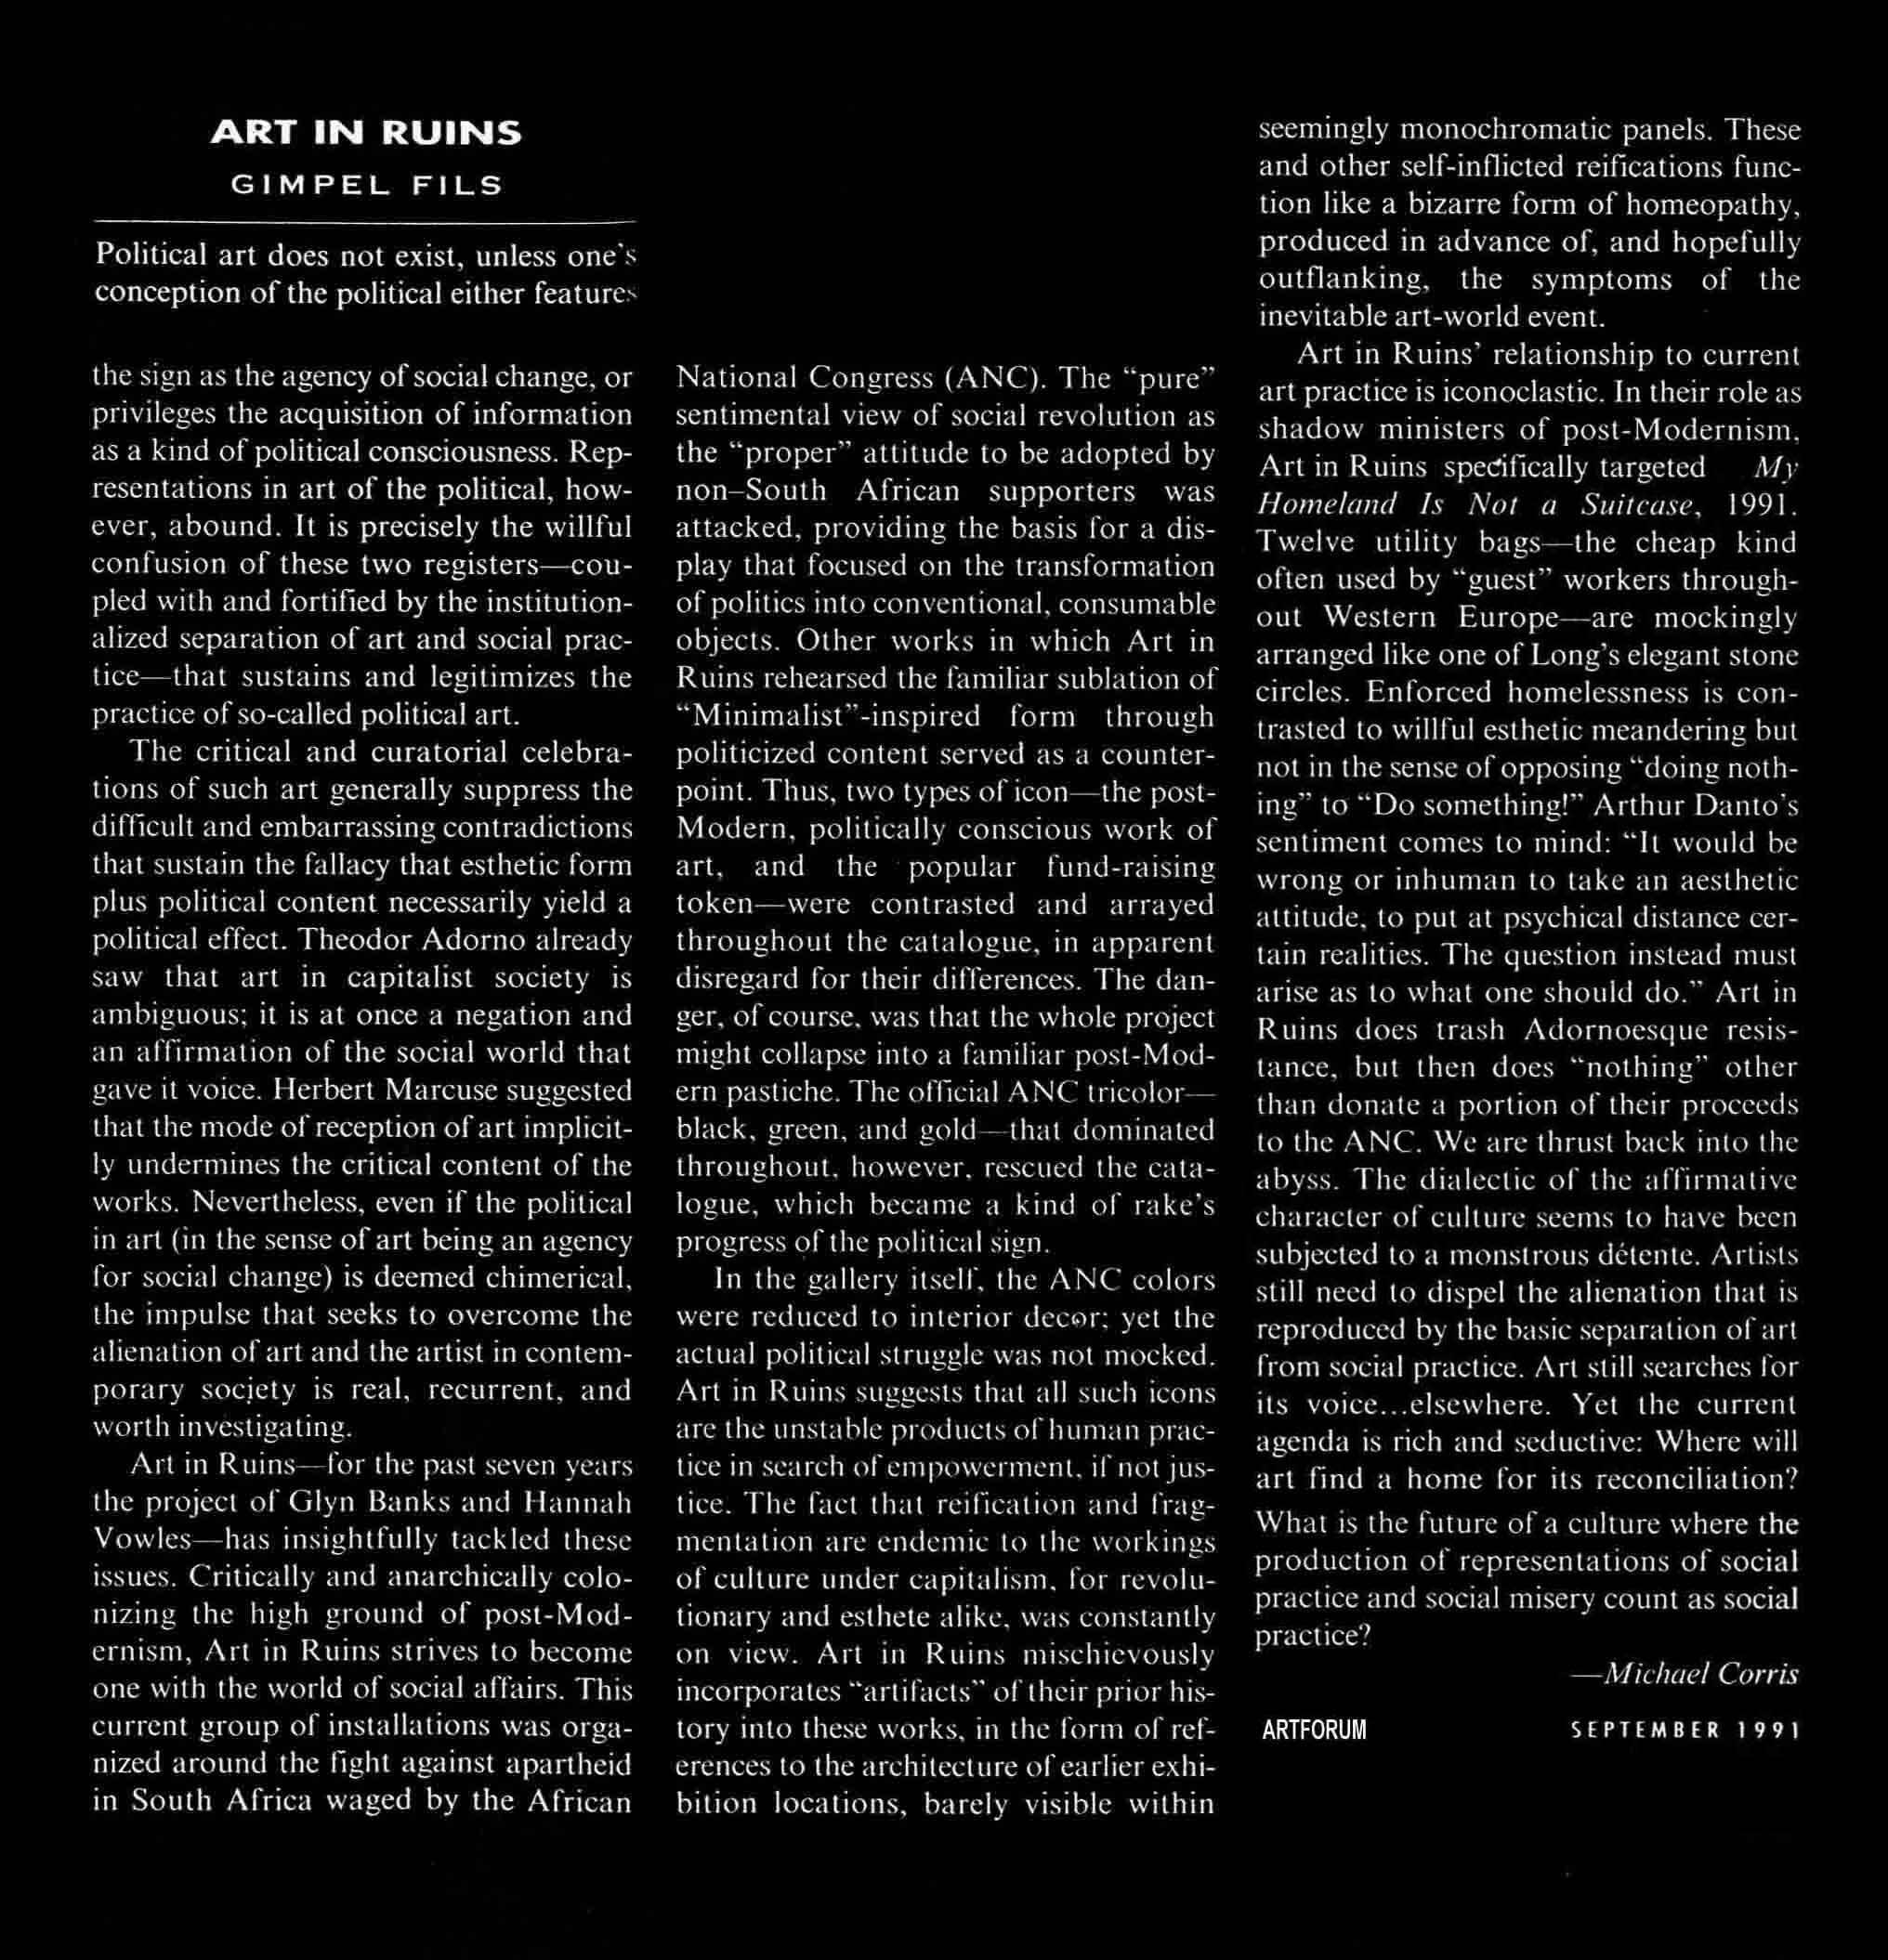 New Work: Art in Ruins. Review by Michael Corris Artforum  Sept 1991